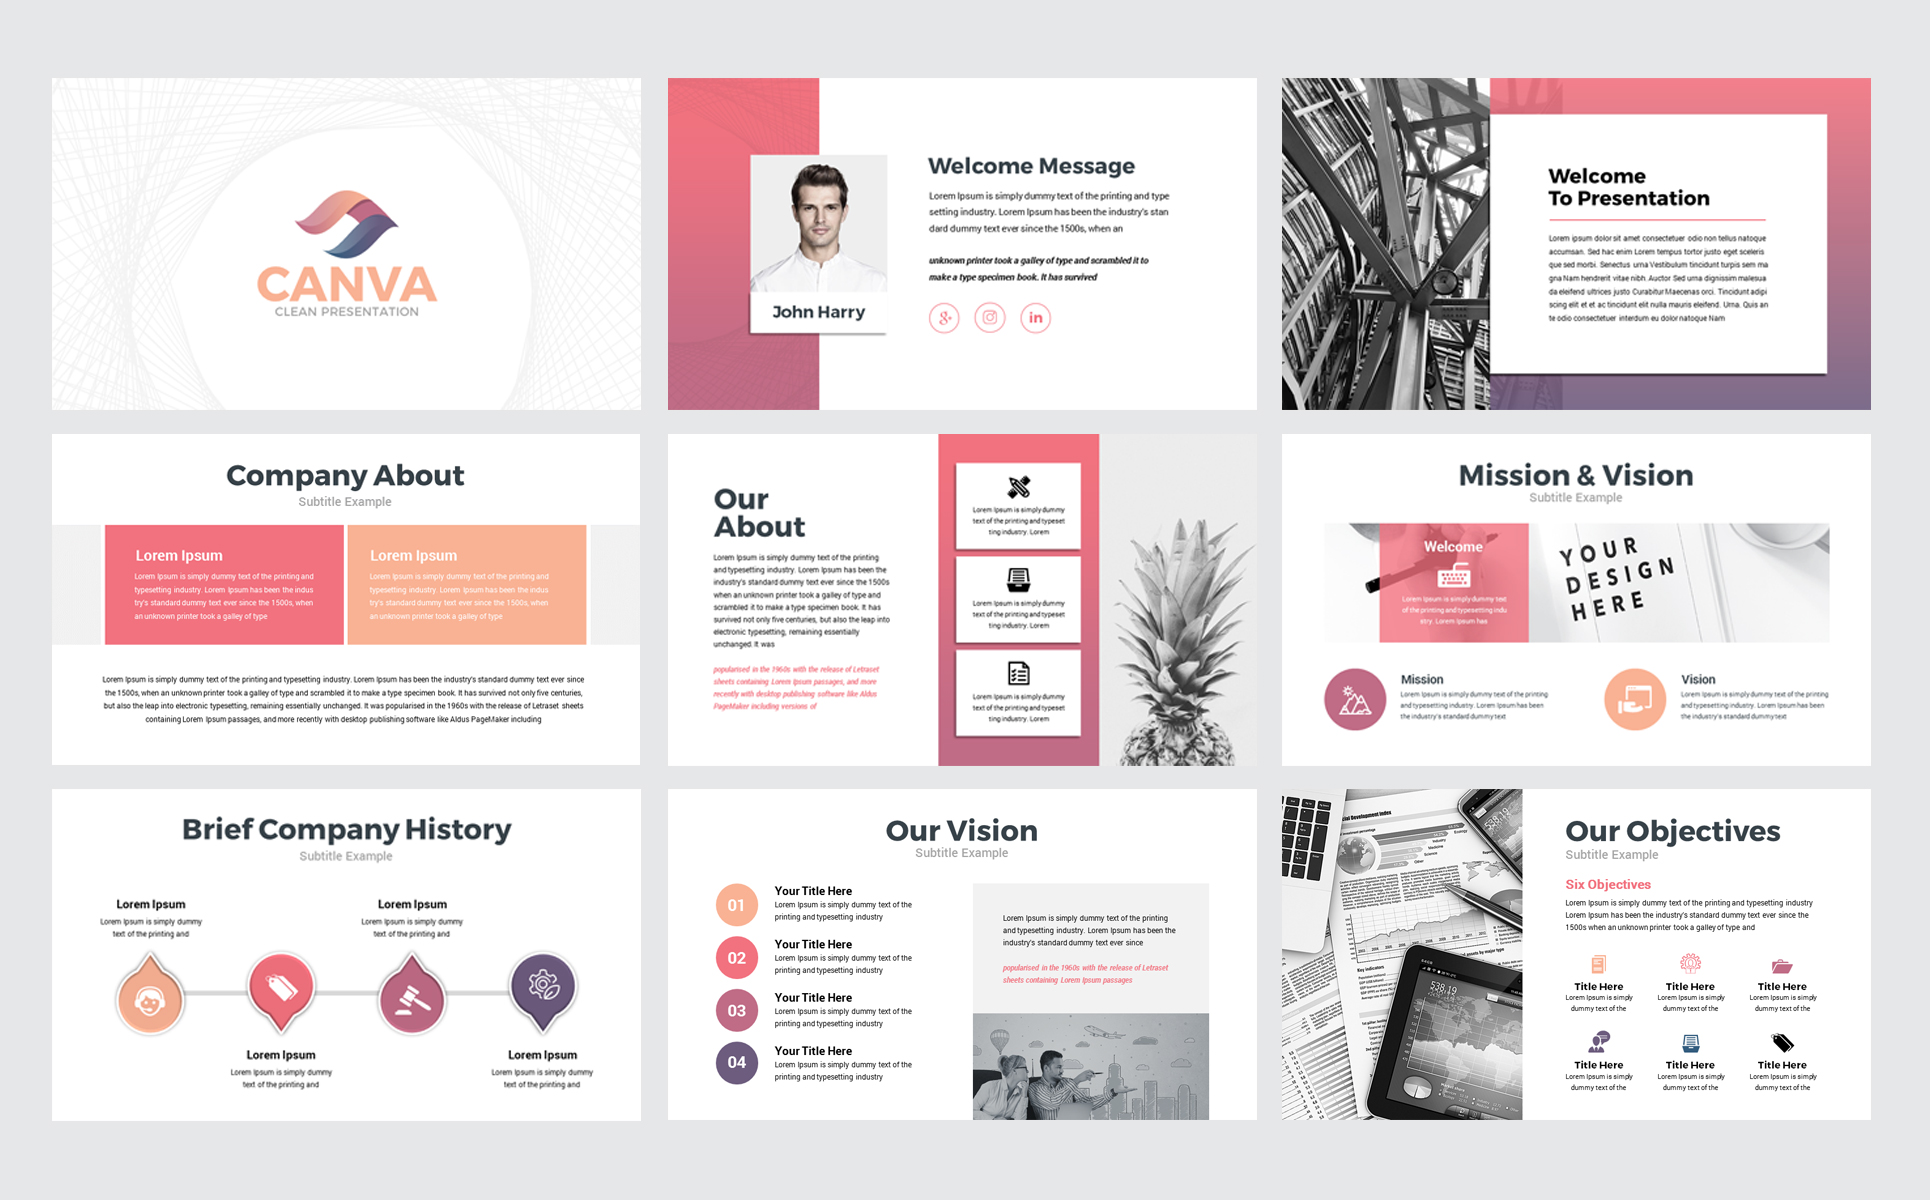 Canva Business Presentation PowerPoint Template